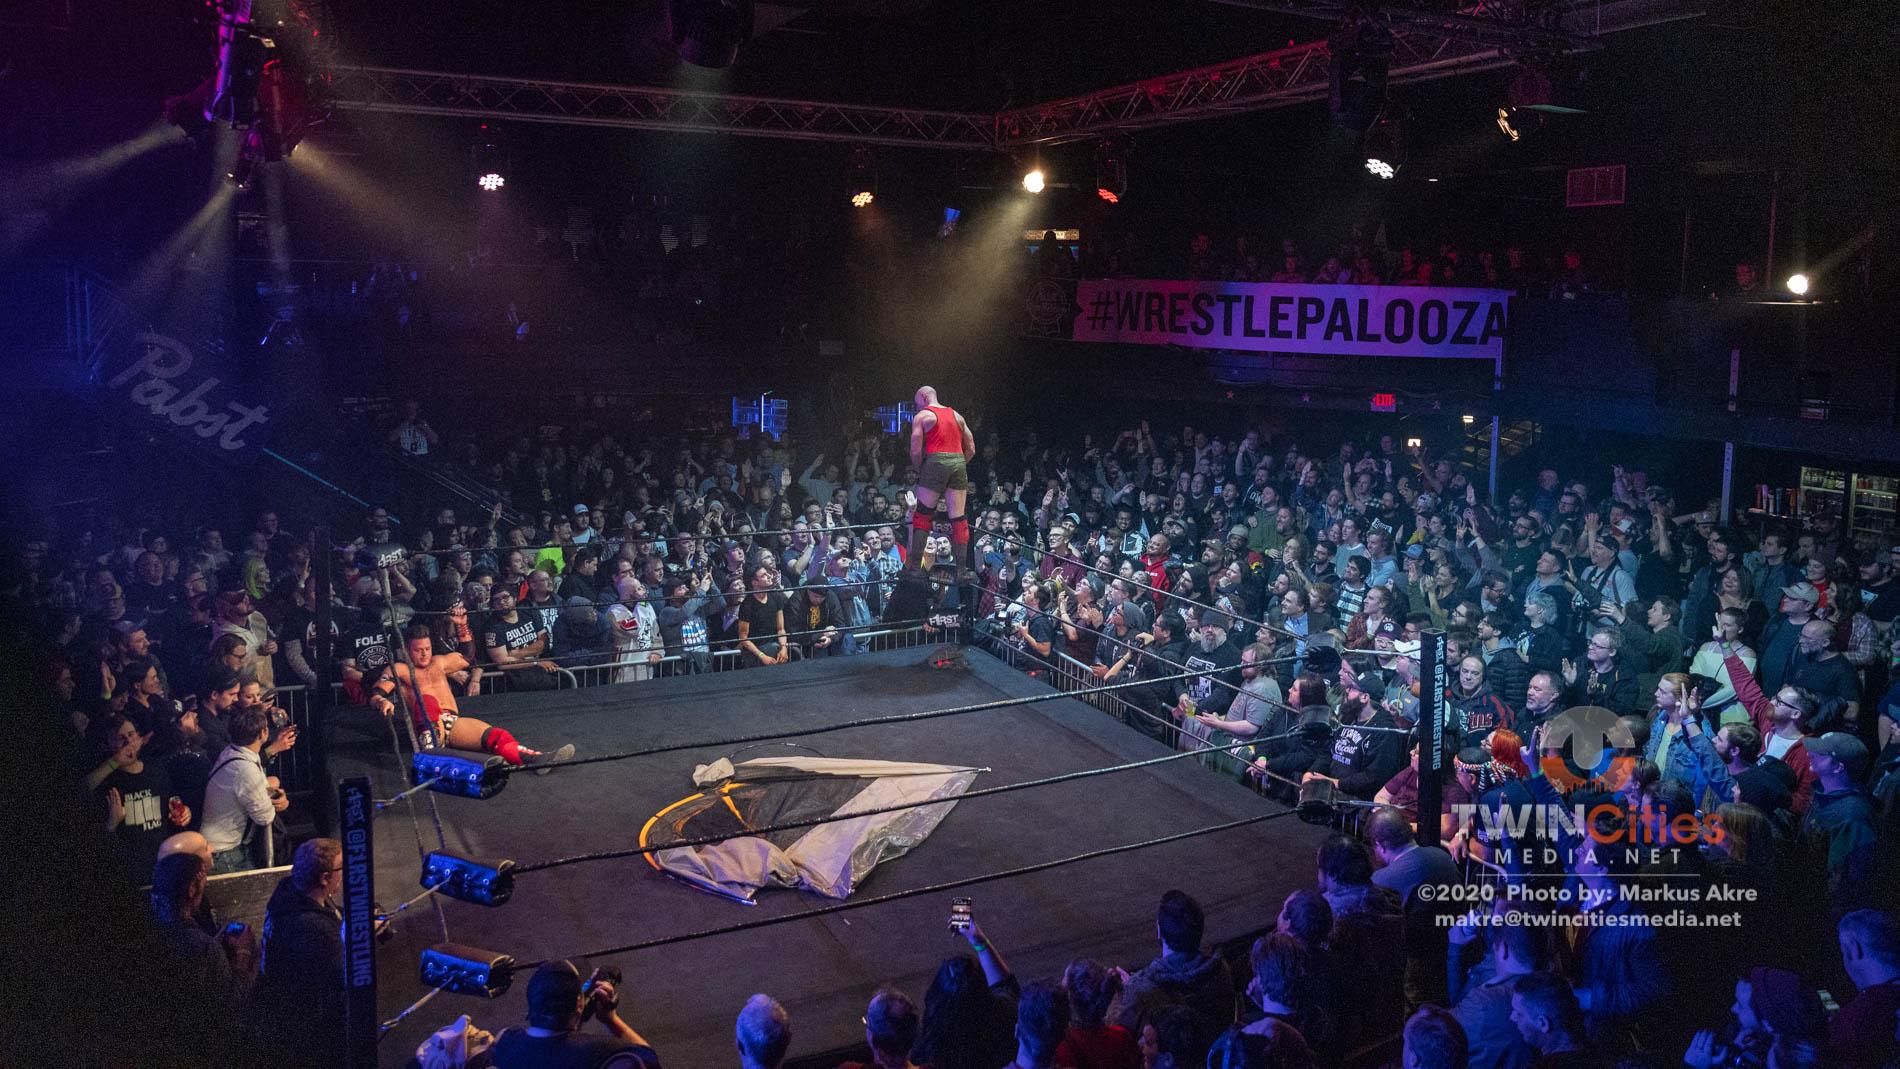 Wrestlepalooza-Day-2-19